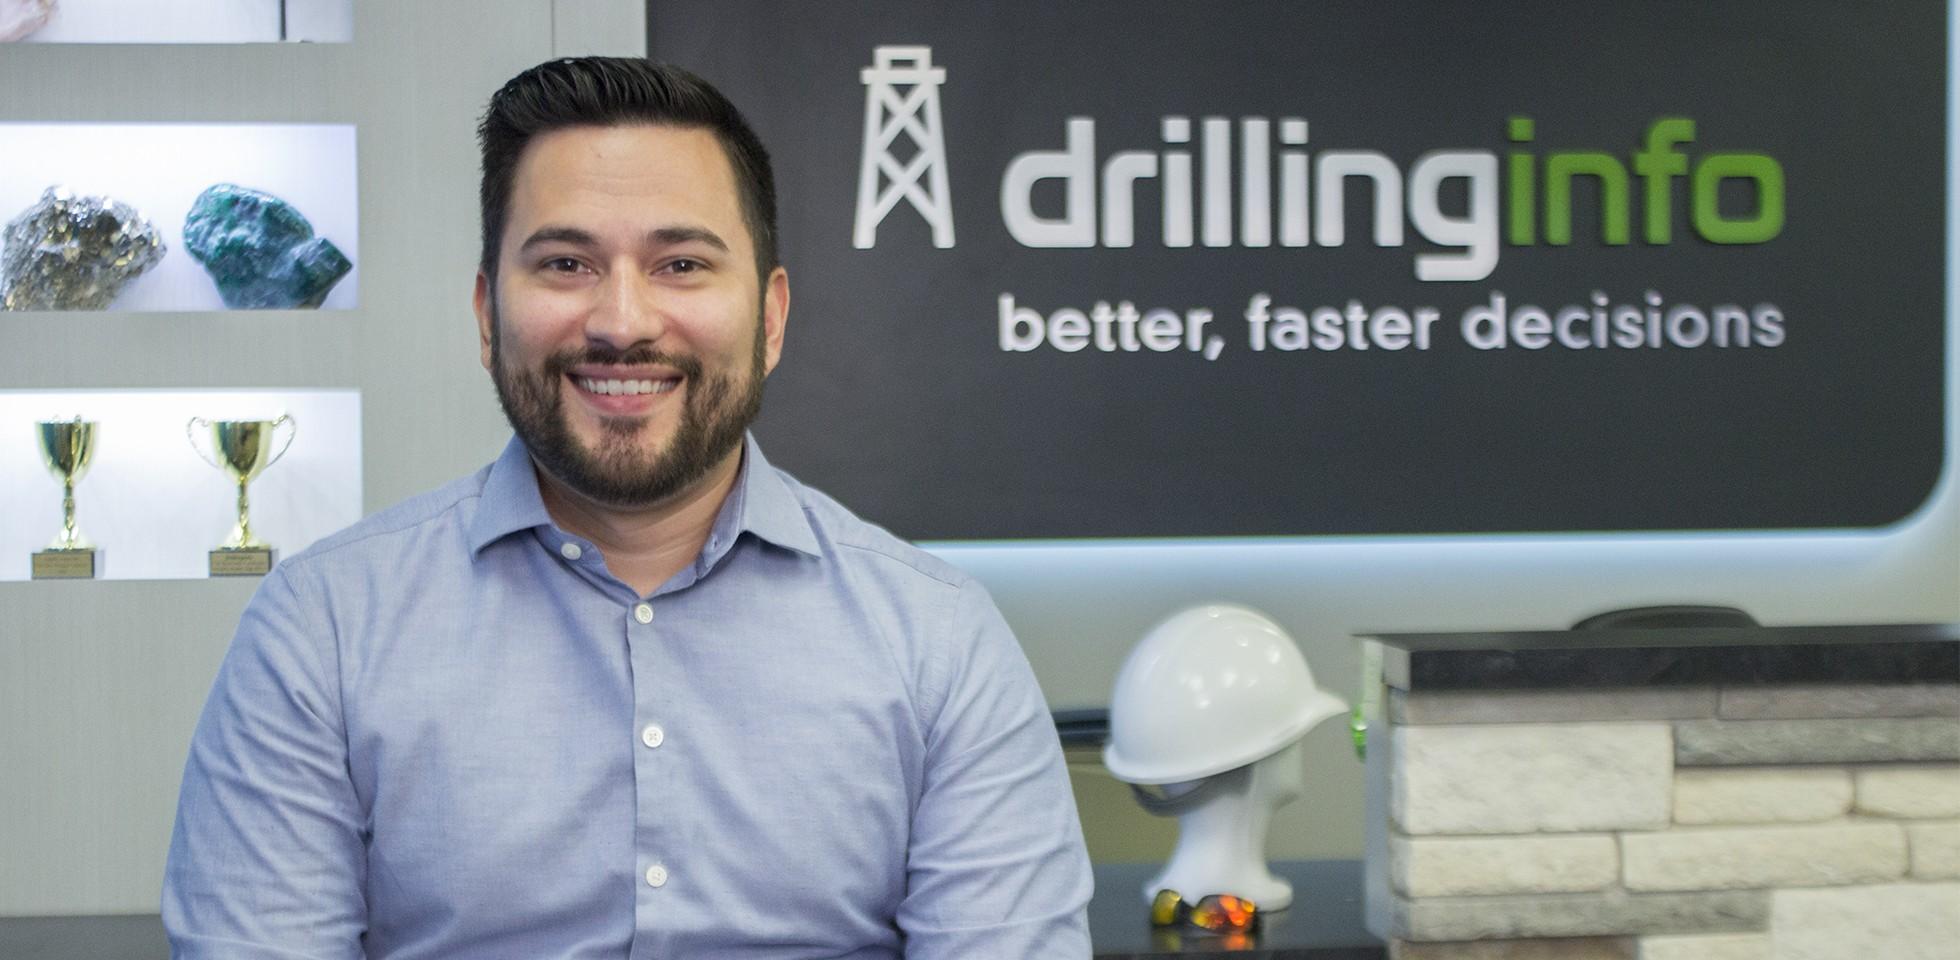 Zach Almaguer, Business Development Representative - Drillinginfo Careers